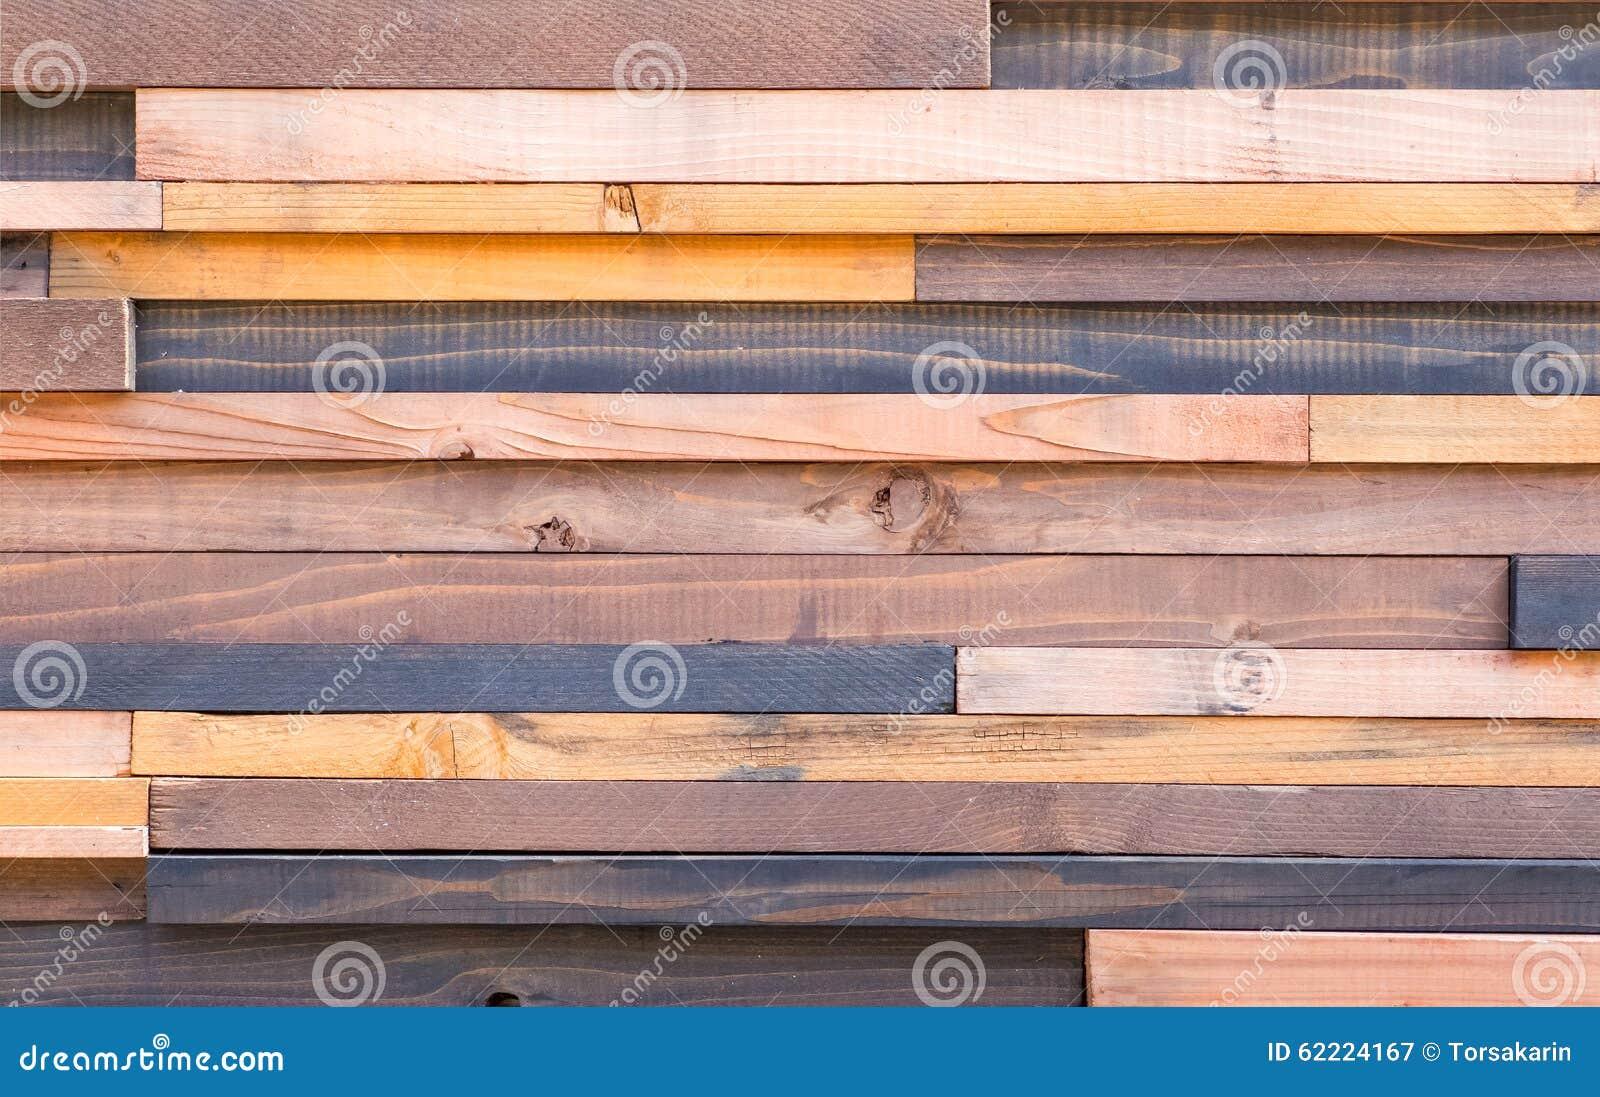 Modern Wood Wall modern wood wall stock photo - image: 41603883